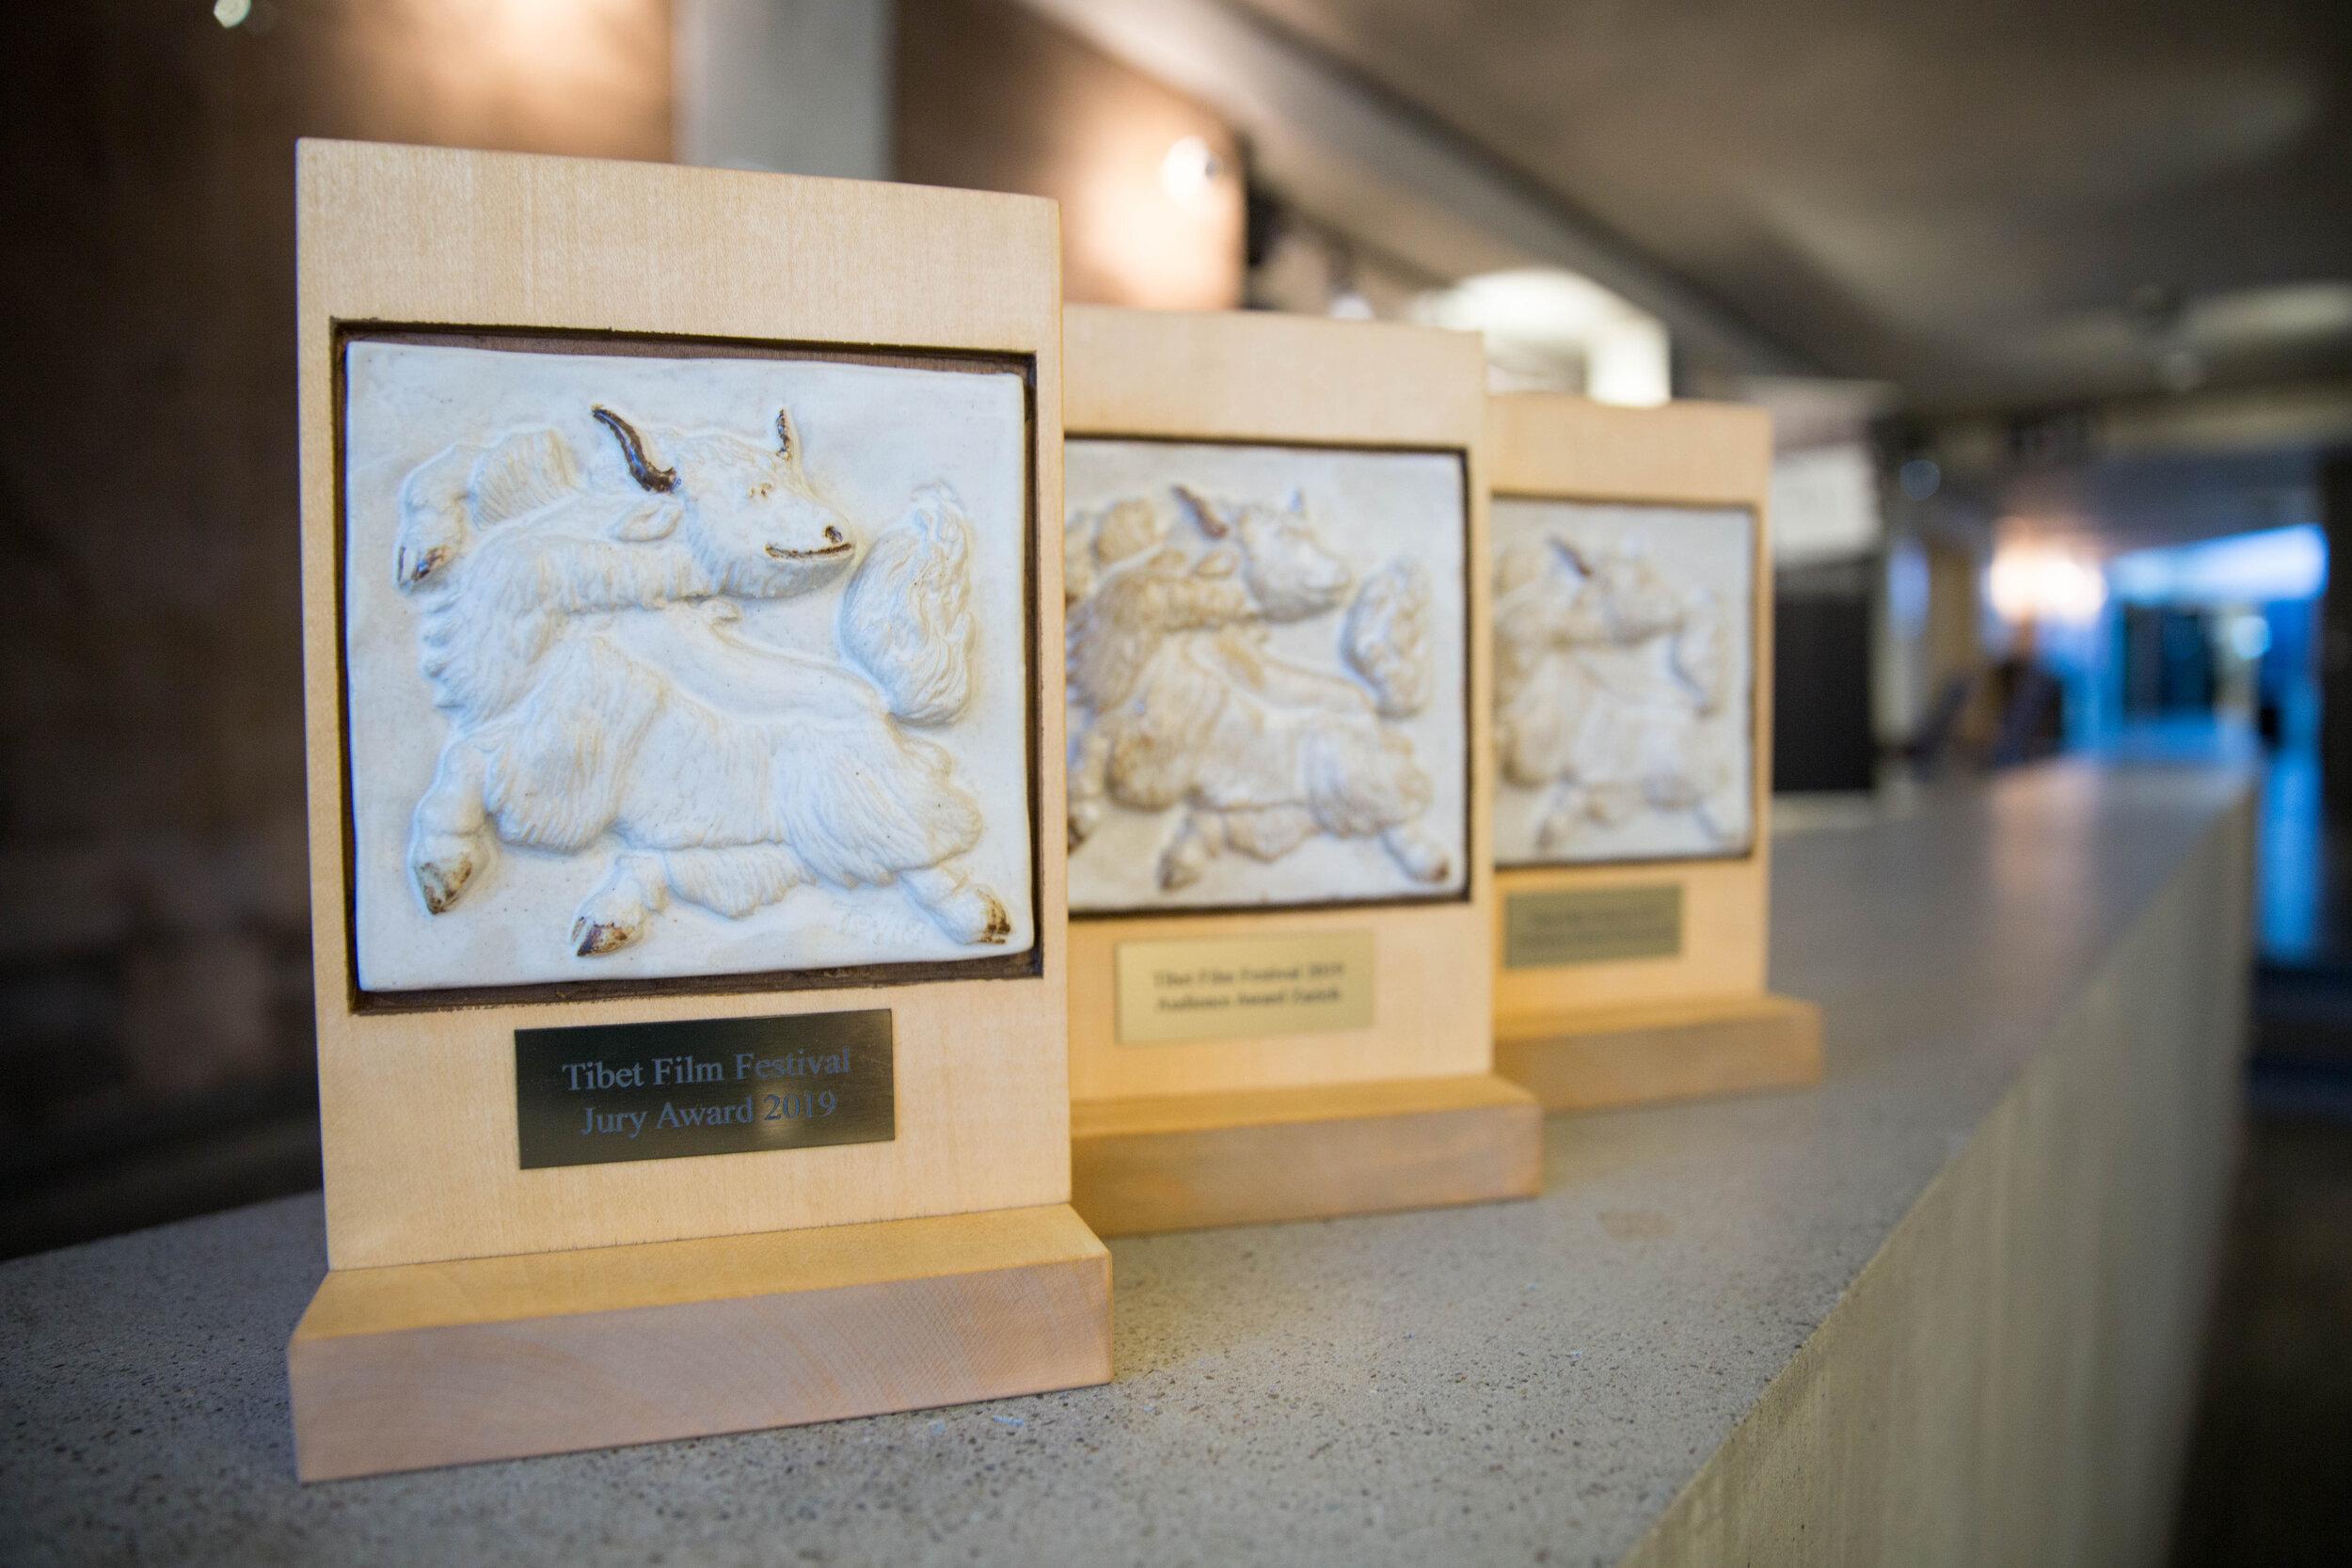 Tibet Film Festival Yak Prizes